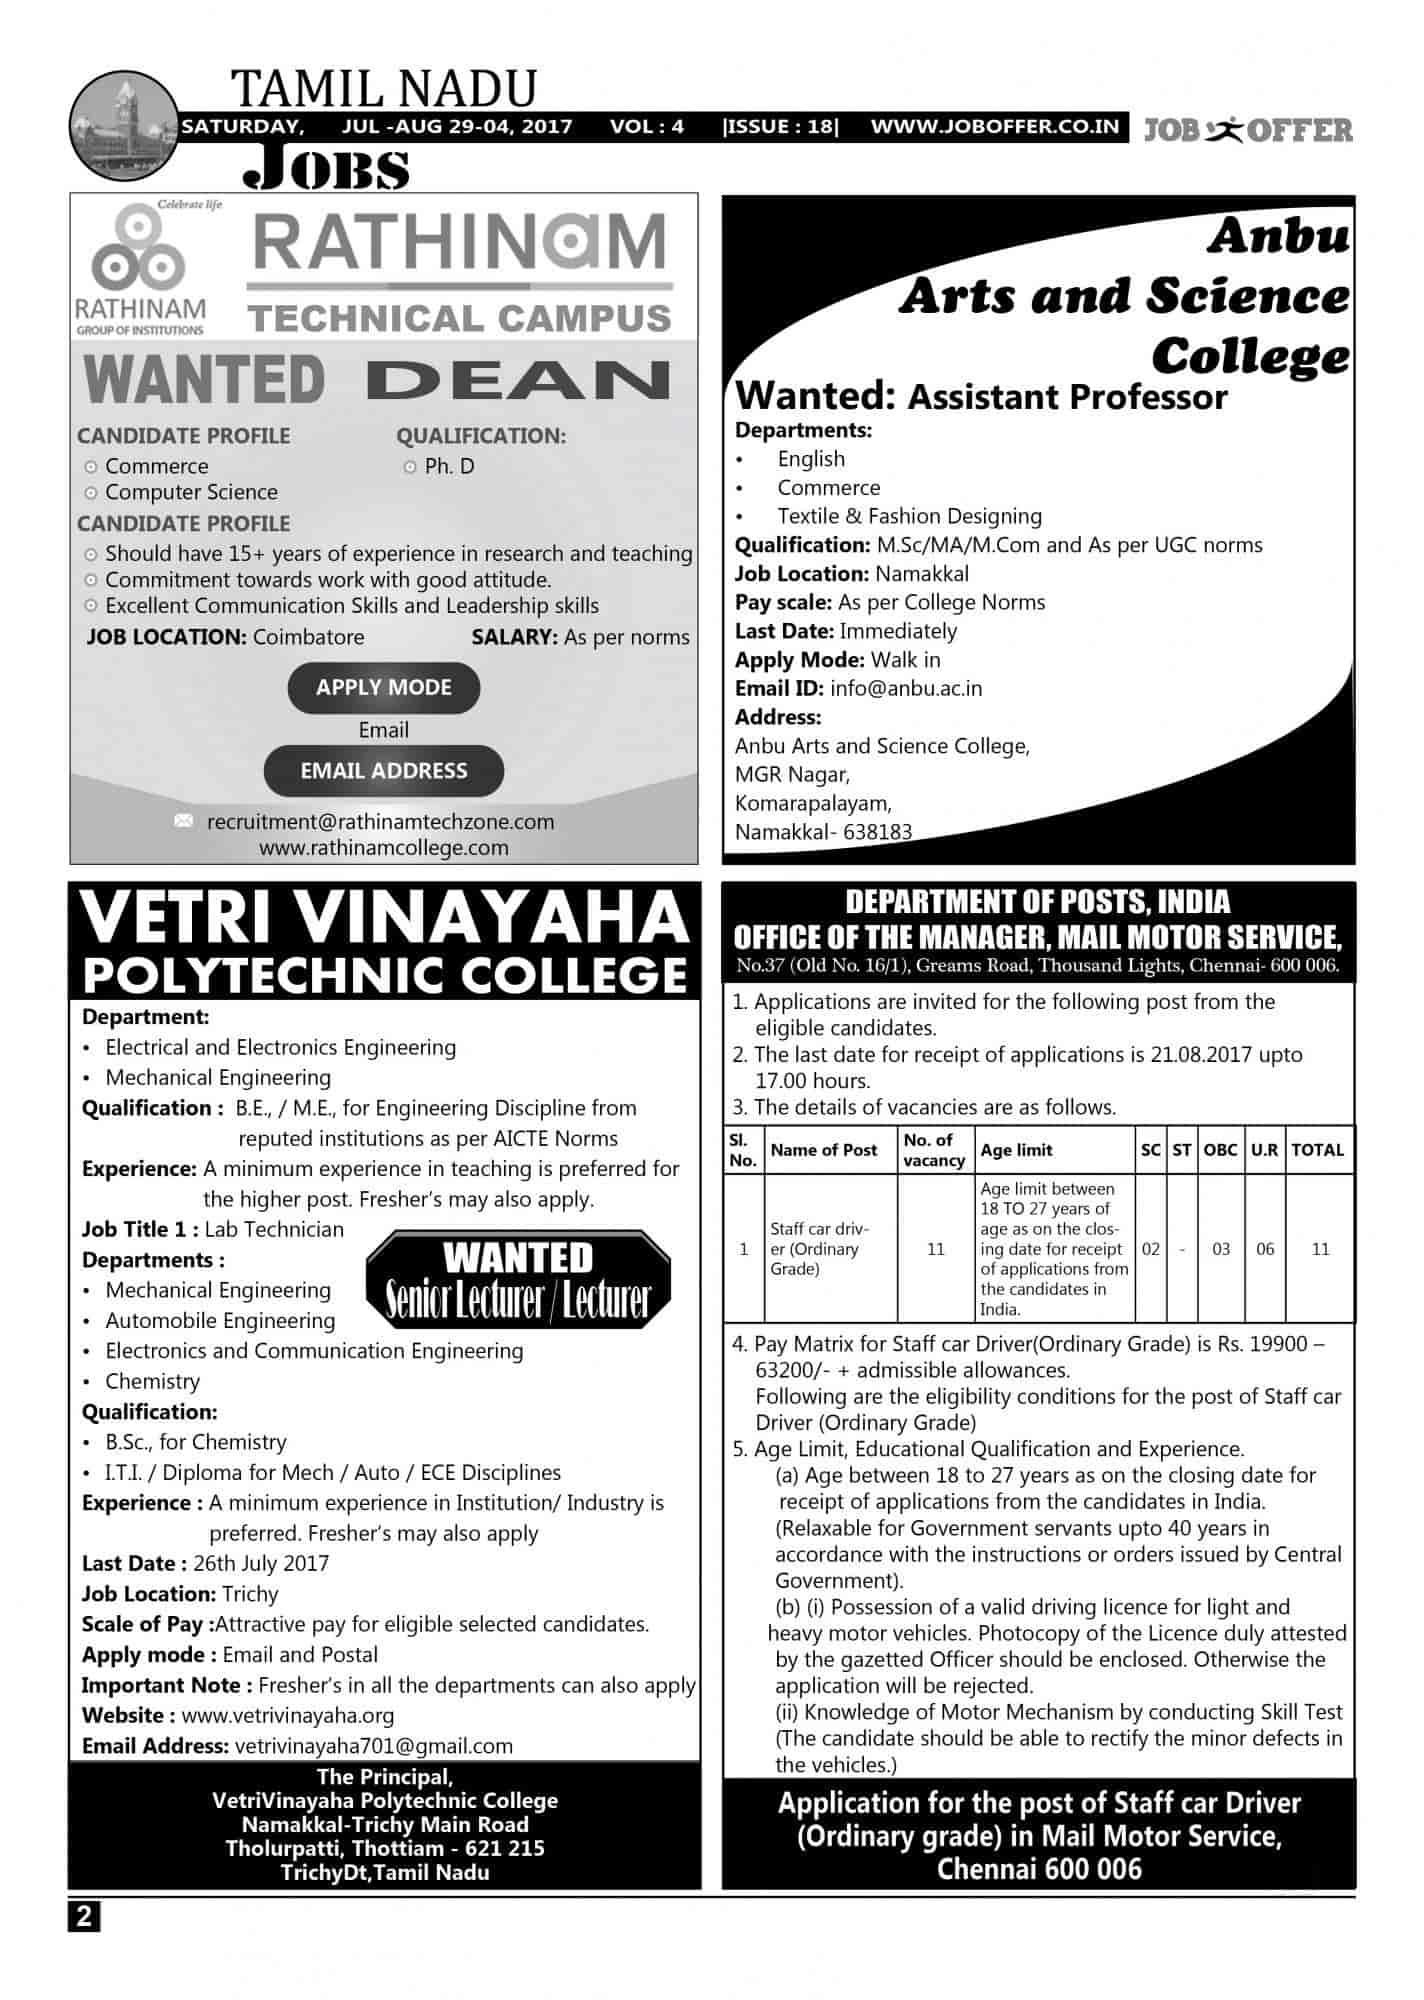 Wunderbar Application Engineer Jobs In Coimbatore Galerie - Bilder ...